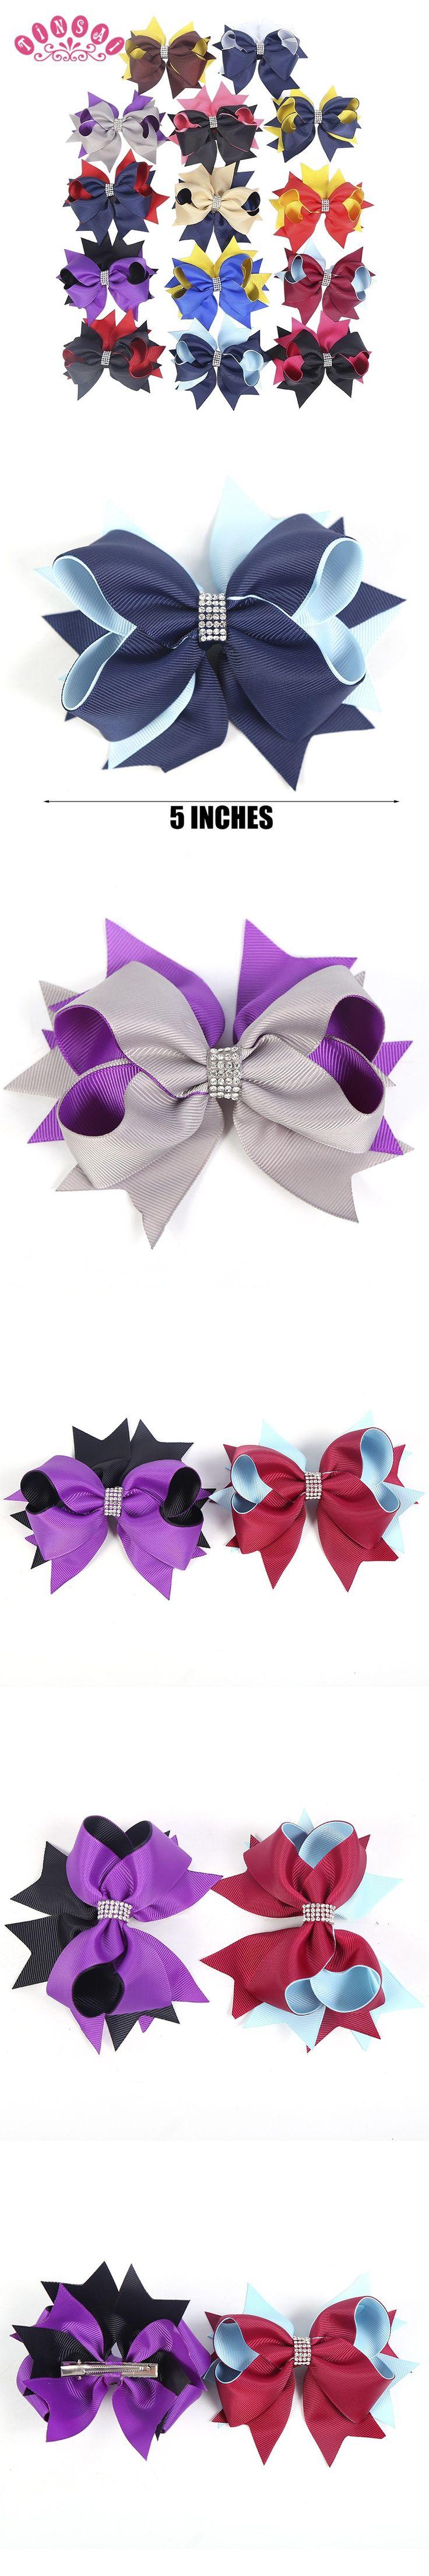 Ha hair accessories for sale - Tinsai 20pc Hair Bows 5 Inch Navy Ribbons Bows Chic Hairpins Children Big Boutique Headband Baby Girl Hair Accessories Wholesale